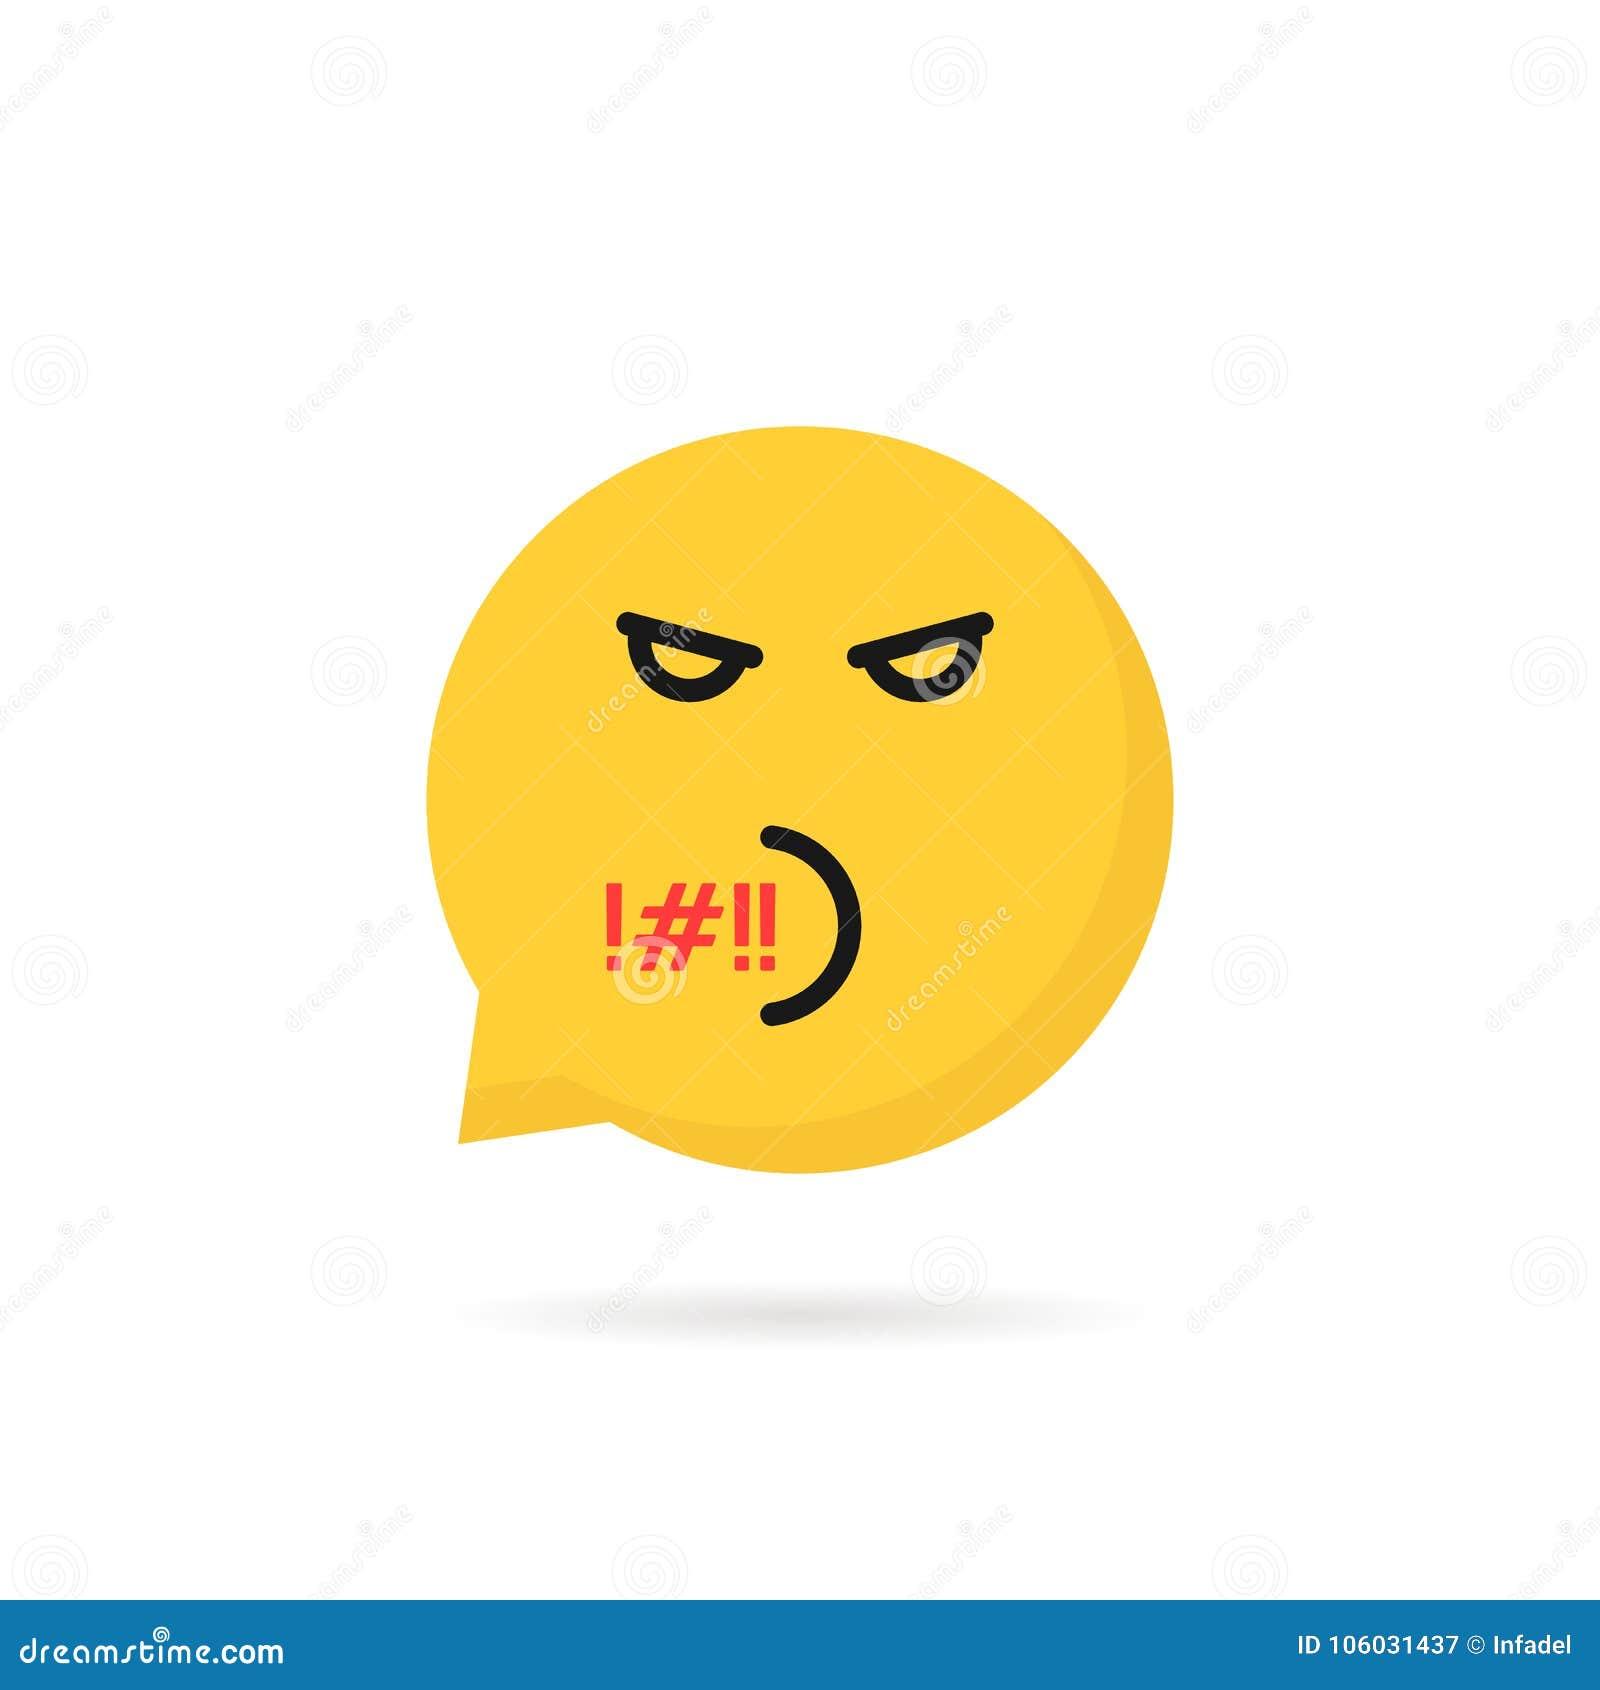 Rude Emoji Speech Bubble Logo Stock Vector - Illustration of